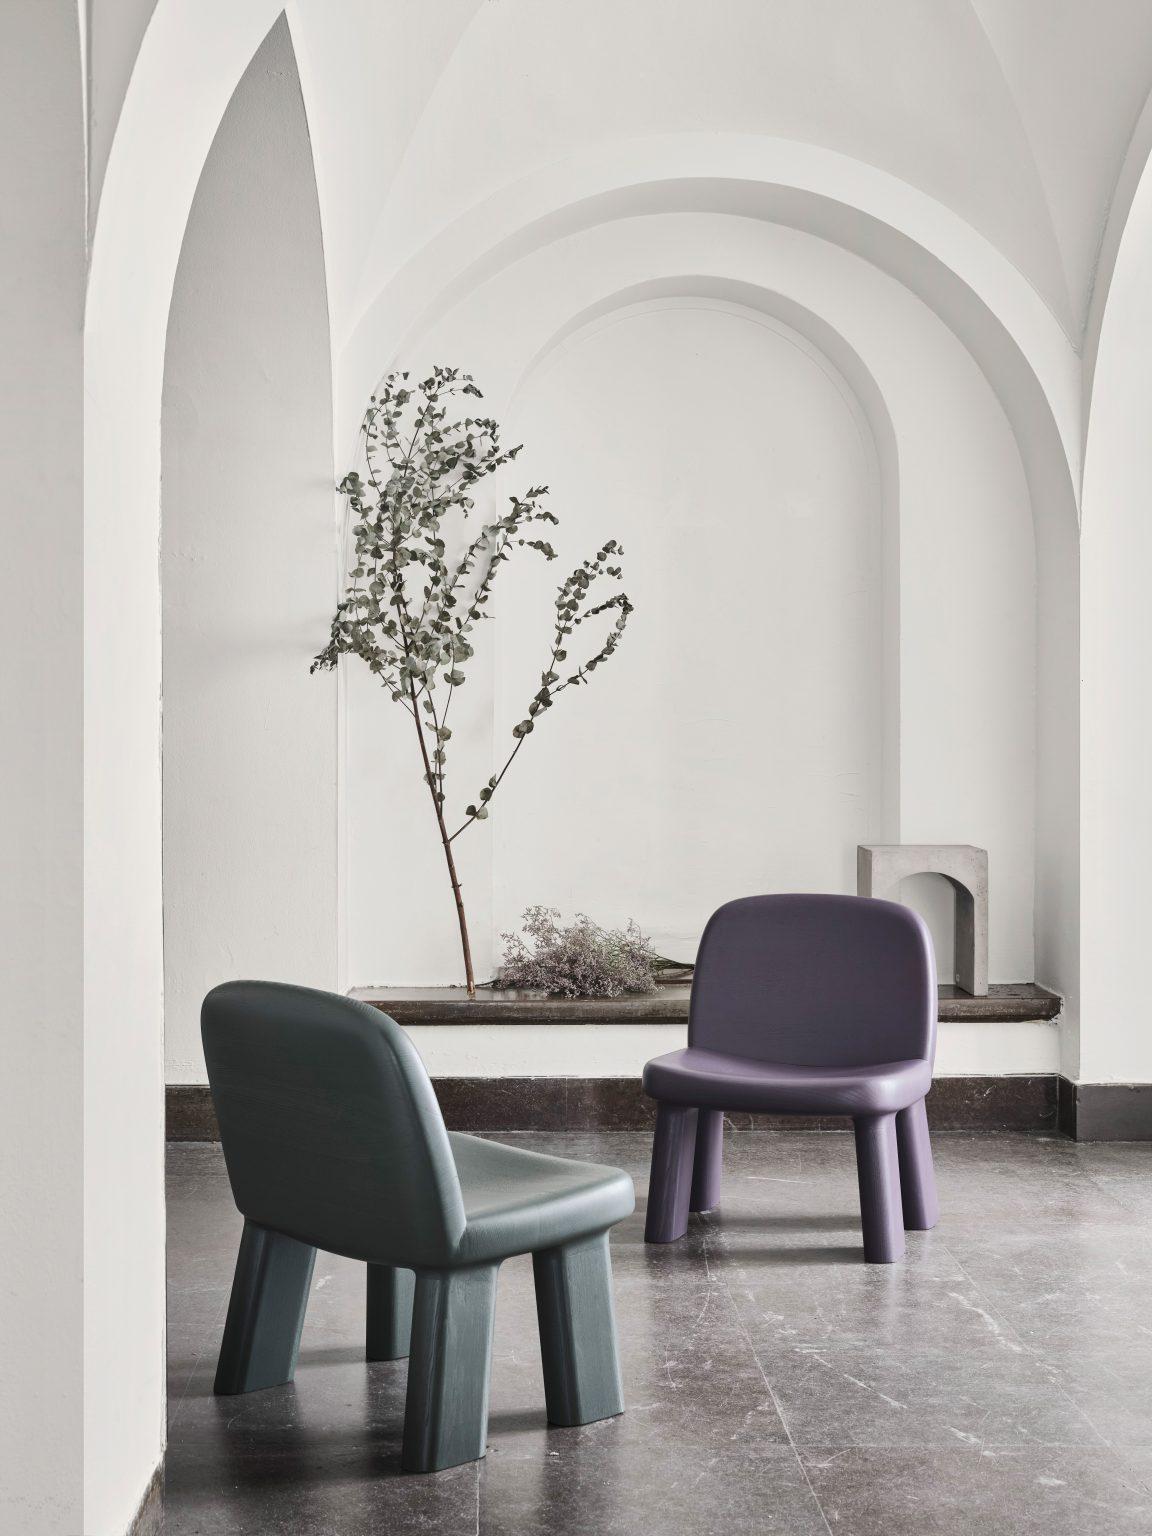 Biennale Interieur - Belgium's leading design and interior event - Maximus-project-3-new.jpg